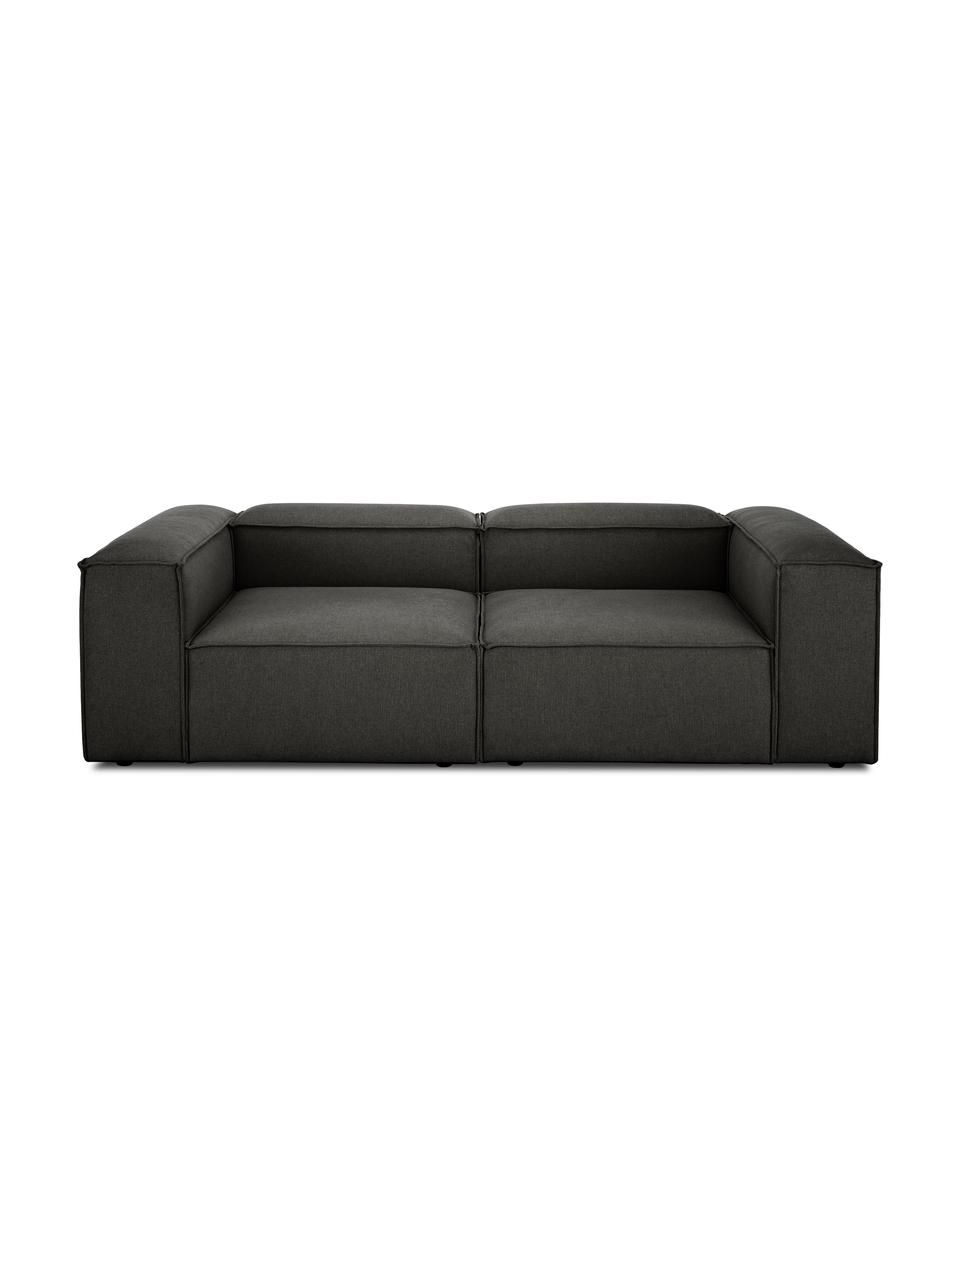 Modulares Sofa Lennon (3-Sitzer) in Anthrazit, Bezug: Polyester Der hochwertige, Gestell: Massives Kiefernholz, Spe, Webstoff Anthrazit, B 238 x T 119 cm